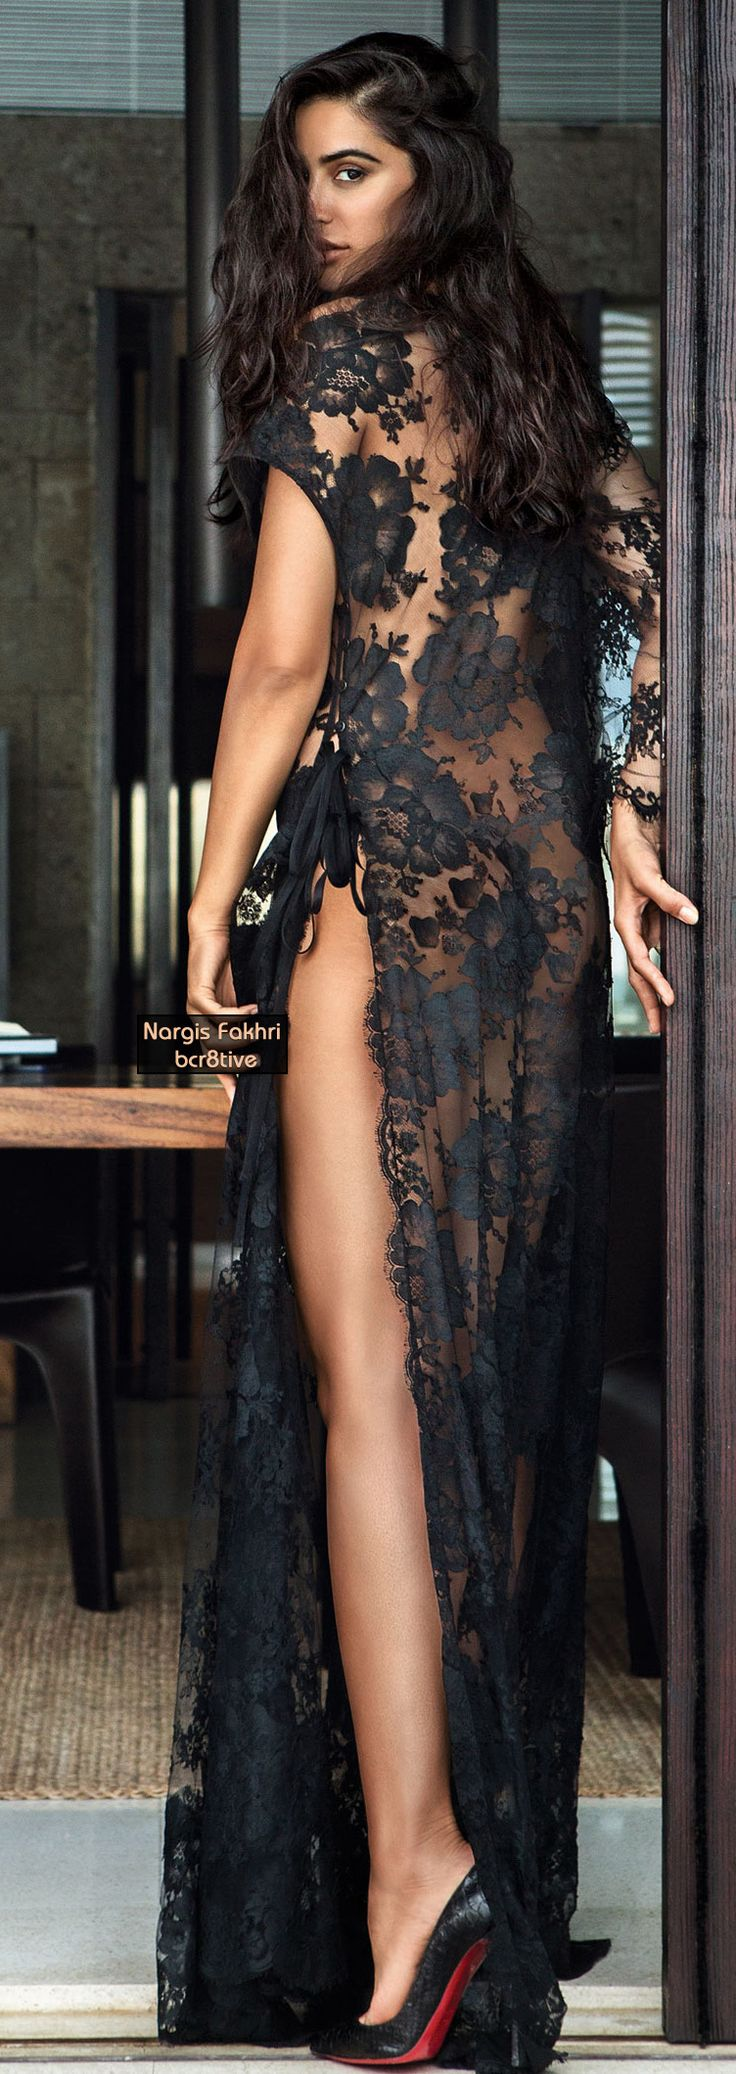 20 hot & sensual photo's of nargis fakhri | the style diva | reckon talk